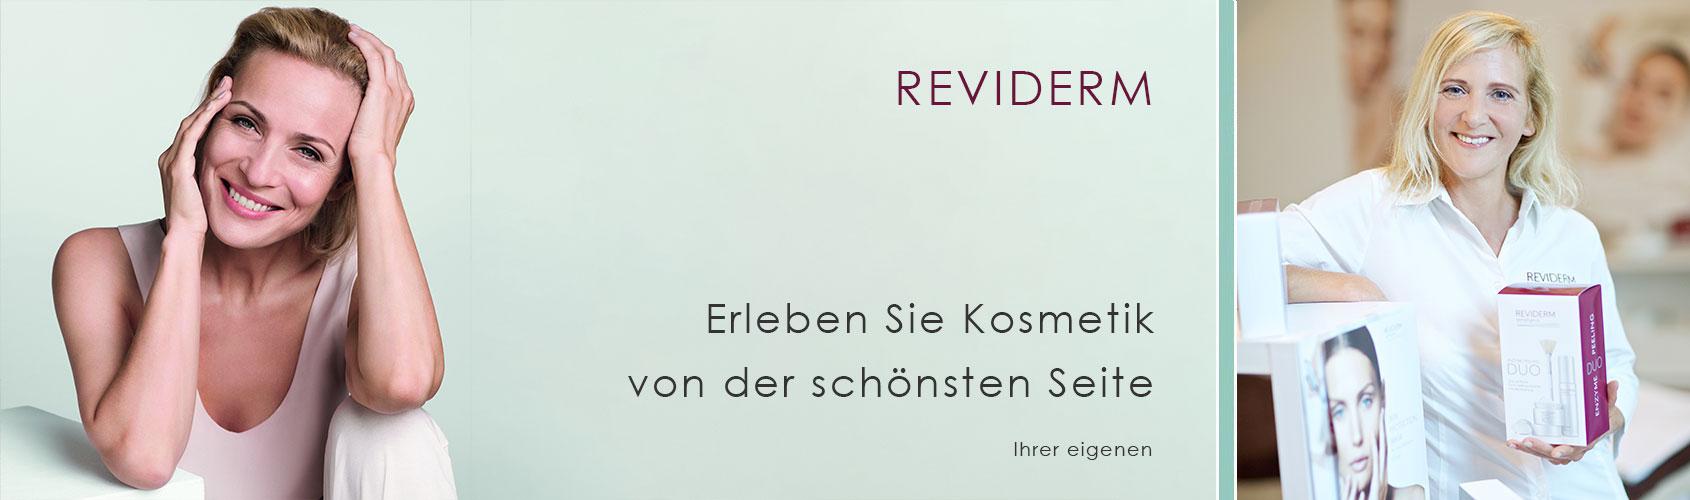 Reviderm Kosmetik Enzesfeld-Lindabrunn